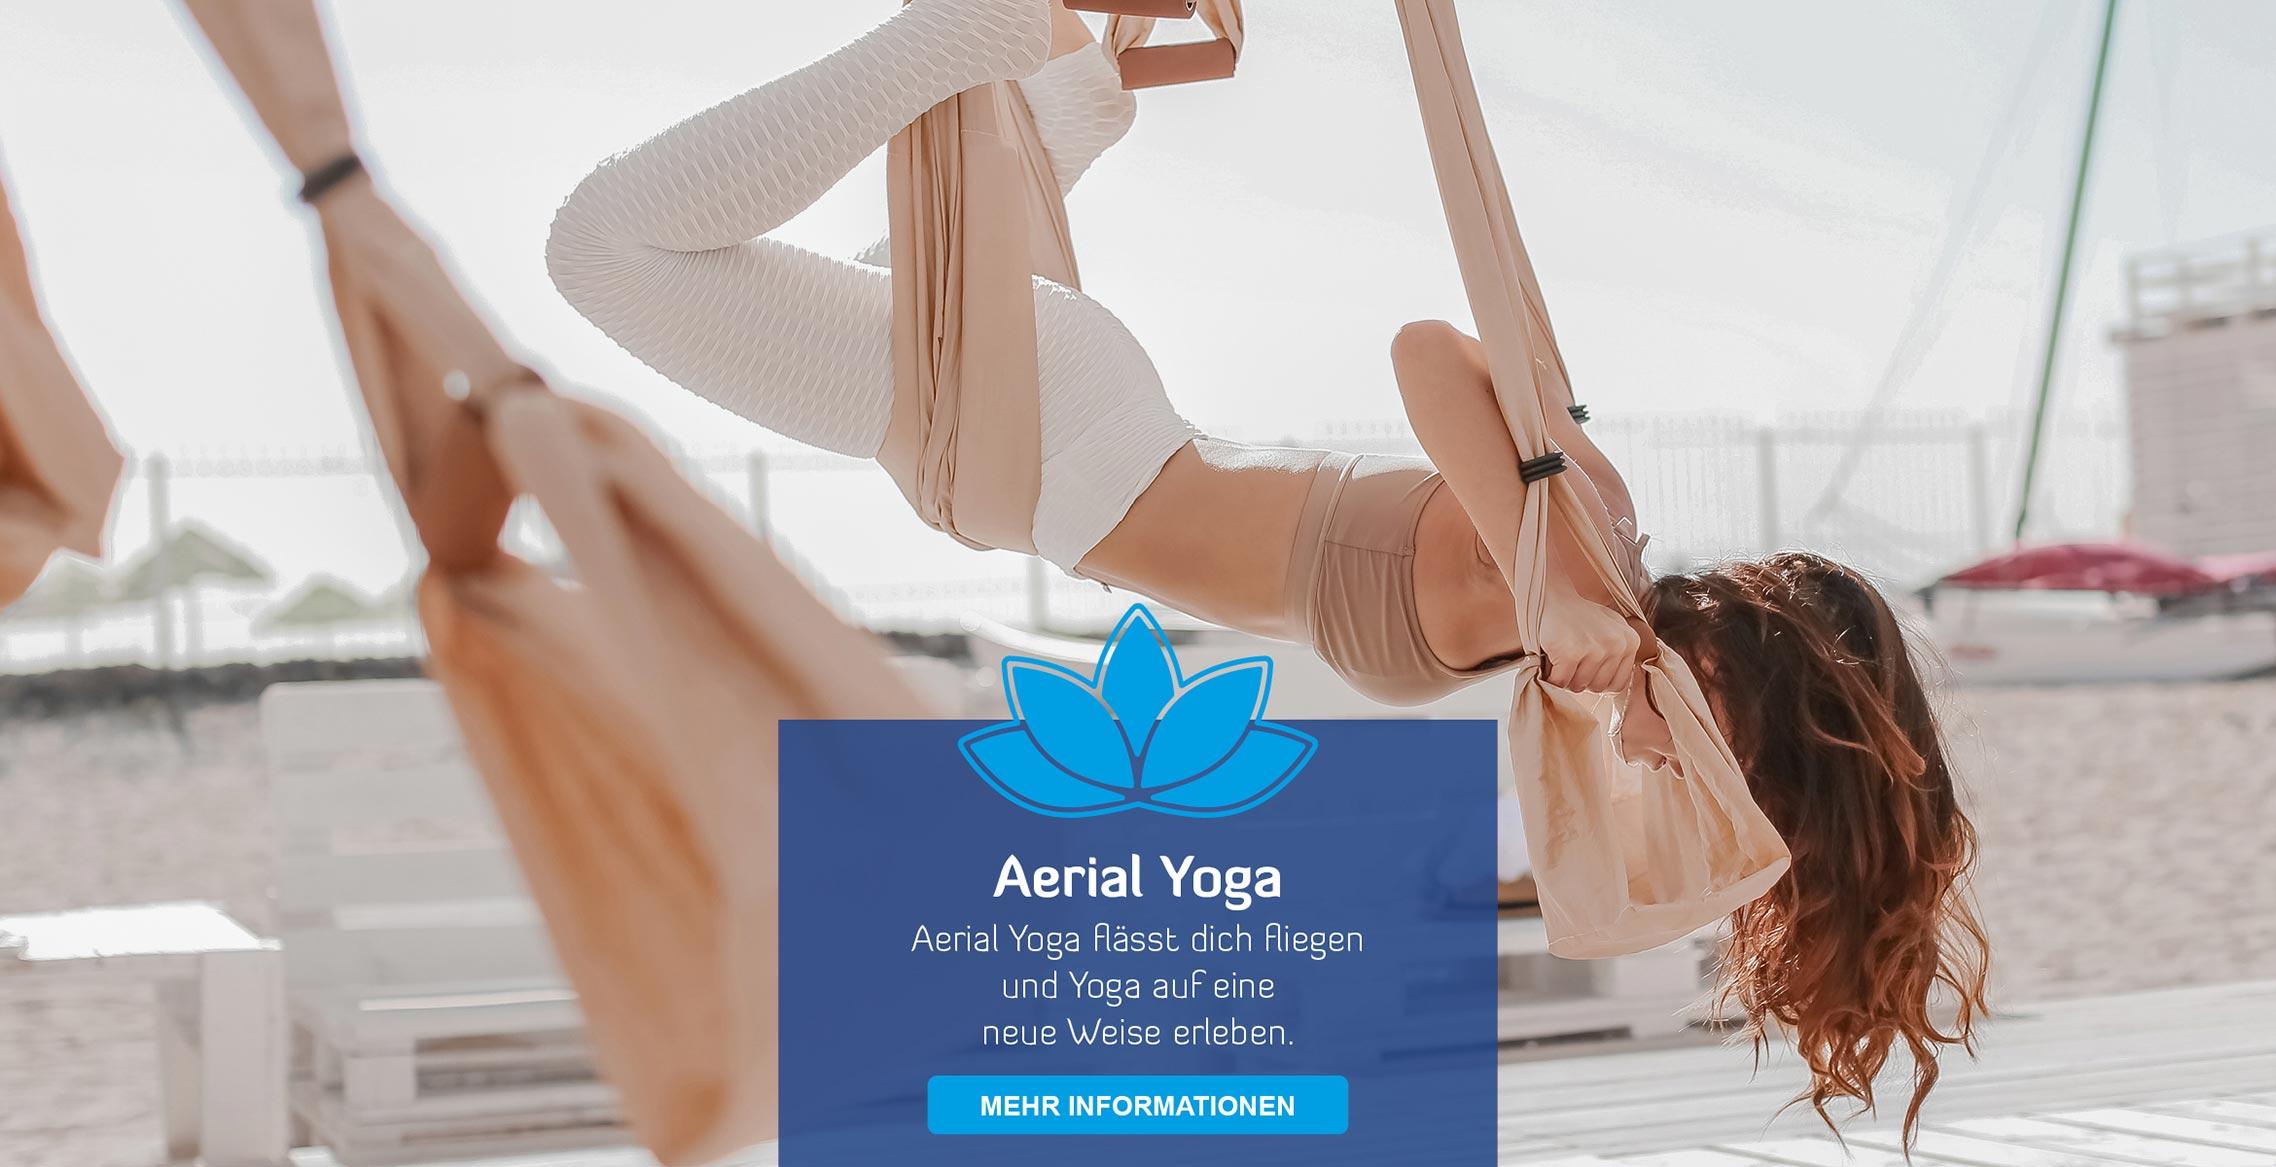 Startseite Teaser Aerial Yoga